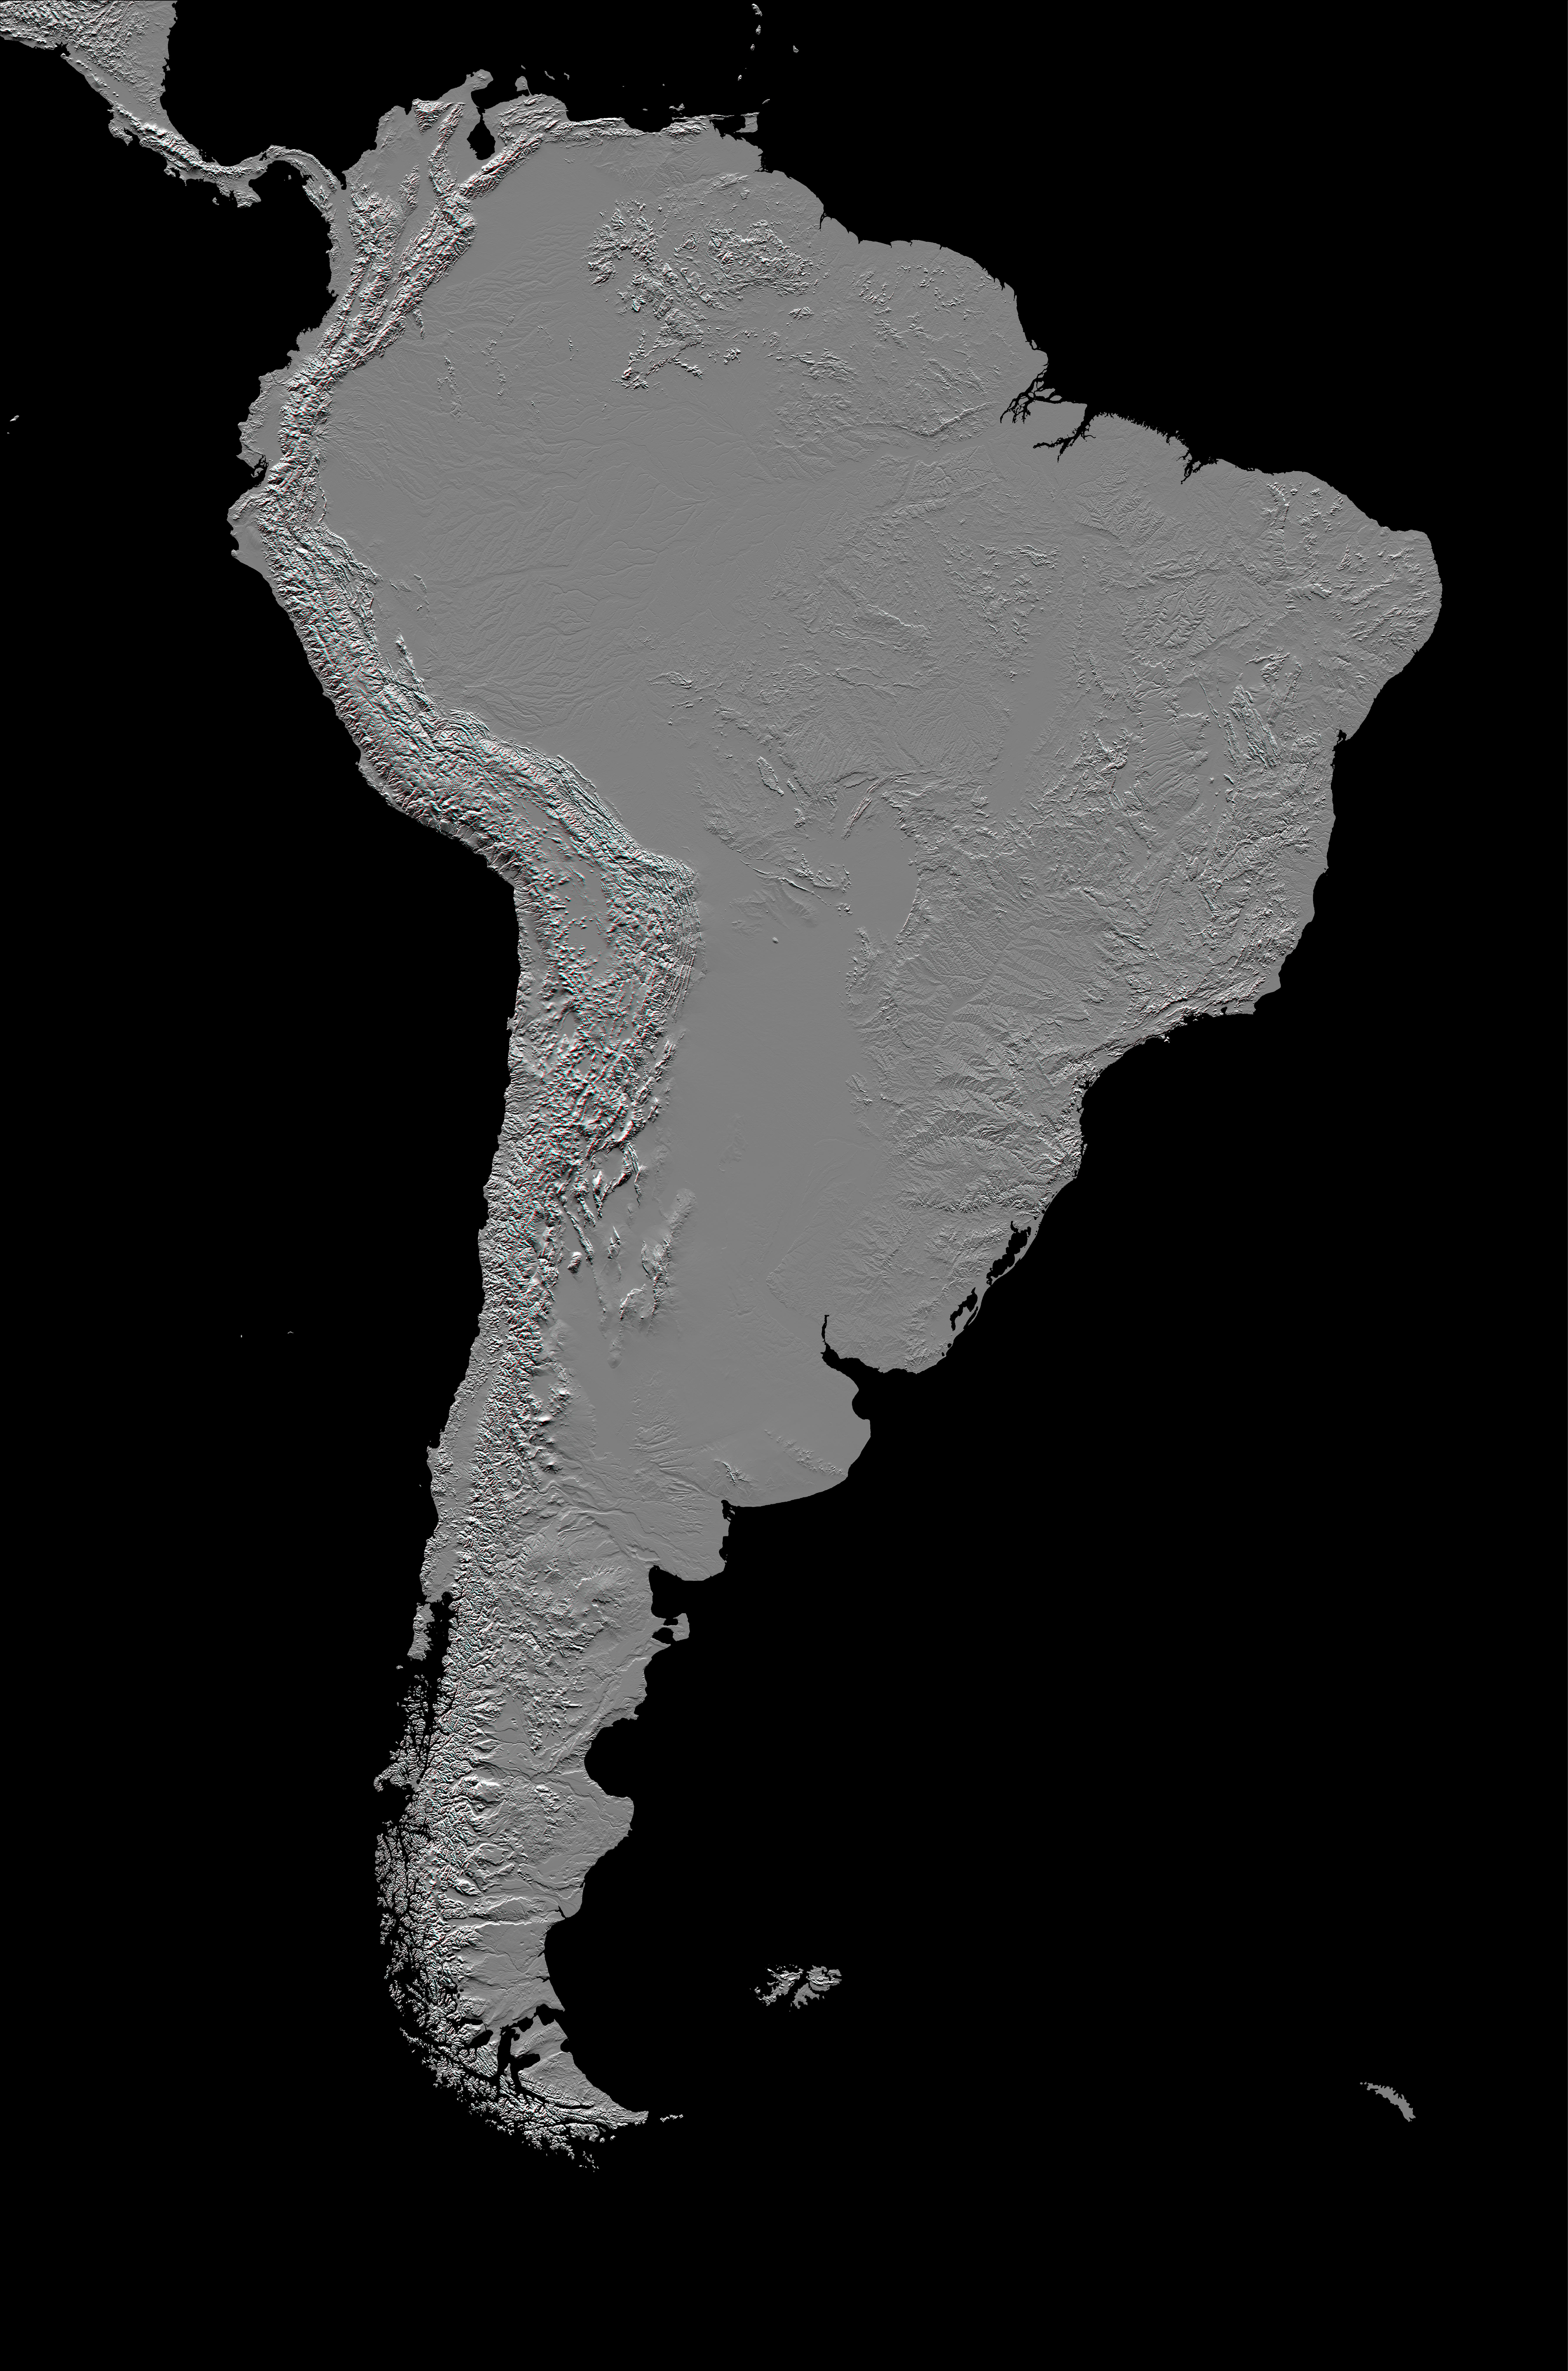 stromausfall südamerika - HD7200×10886